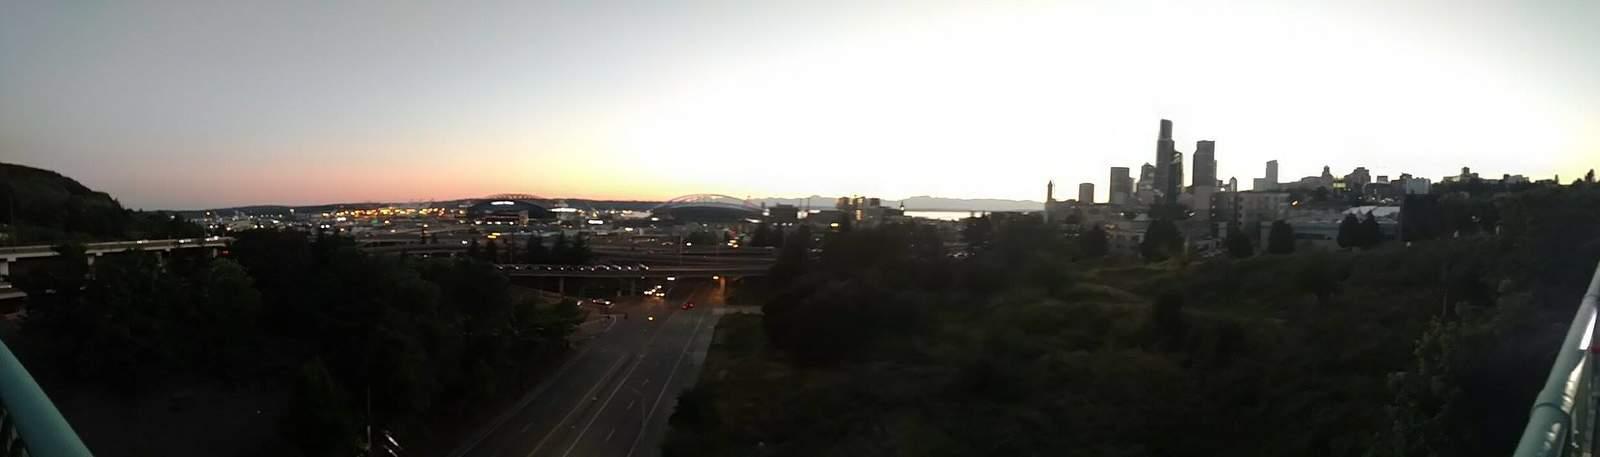 https://s3.amazonaws.com/uploads.bmxmuseum.com/user-images/152/sunset598f206f22.jpg